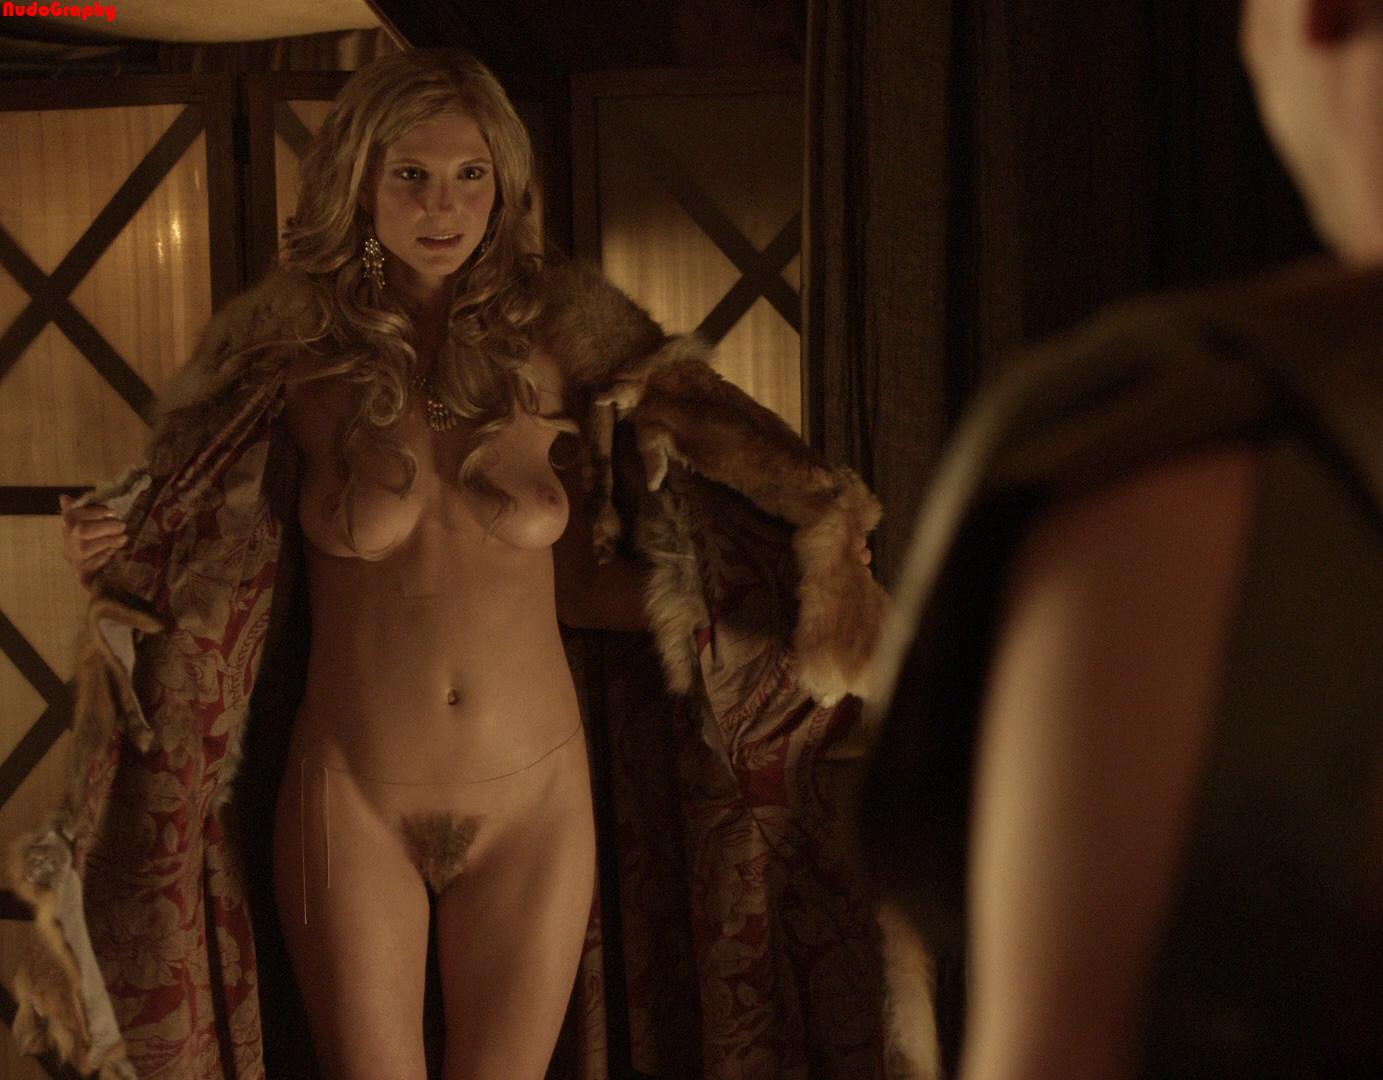 Desnudo foto pic tv show frasier